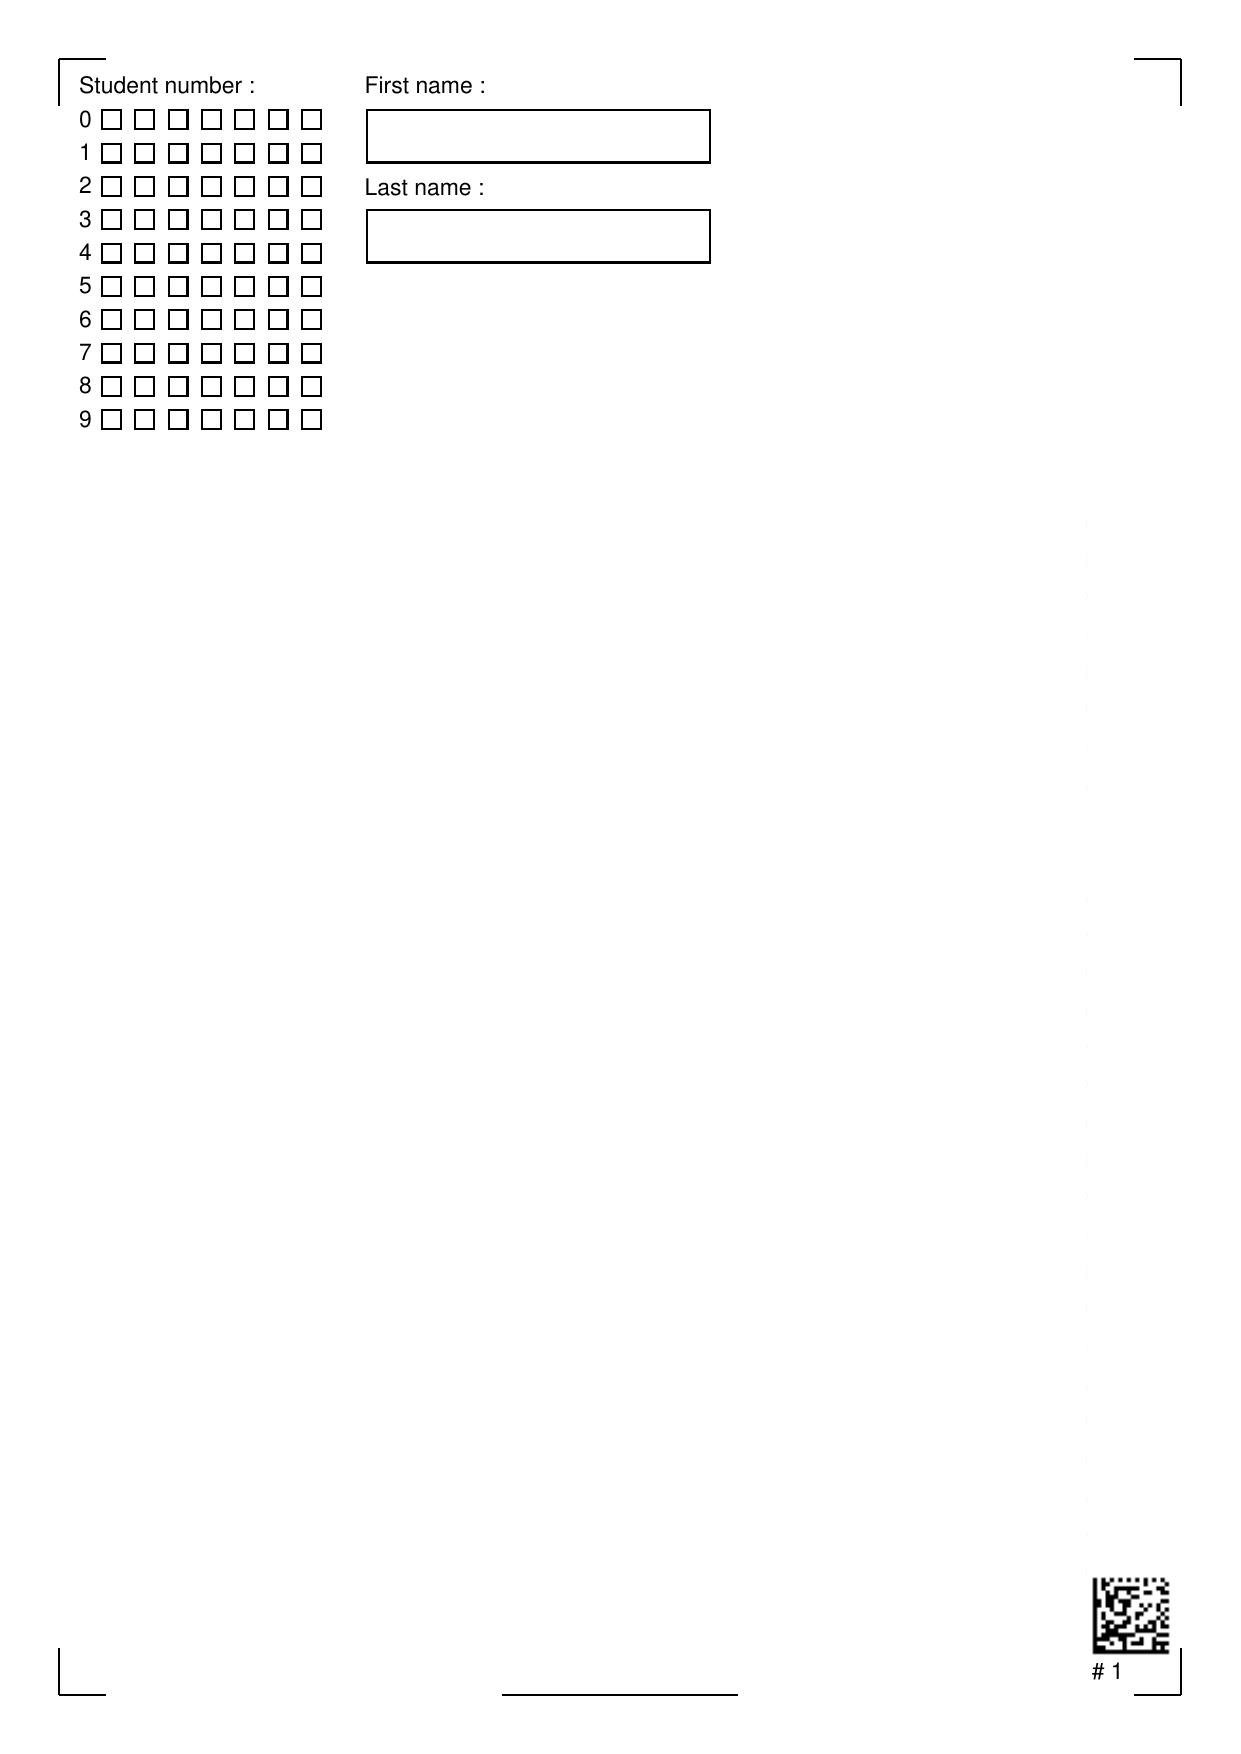 tests/data/scanned_pdfs/sample_exam.jpg